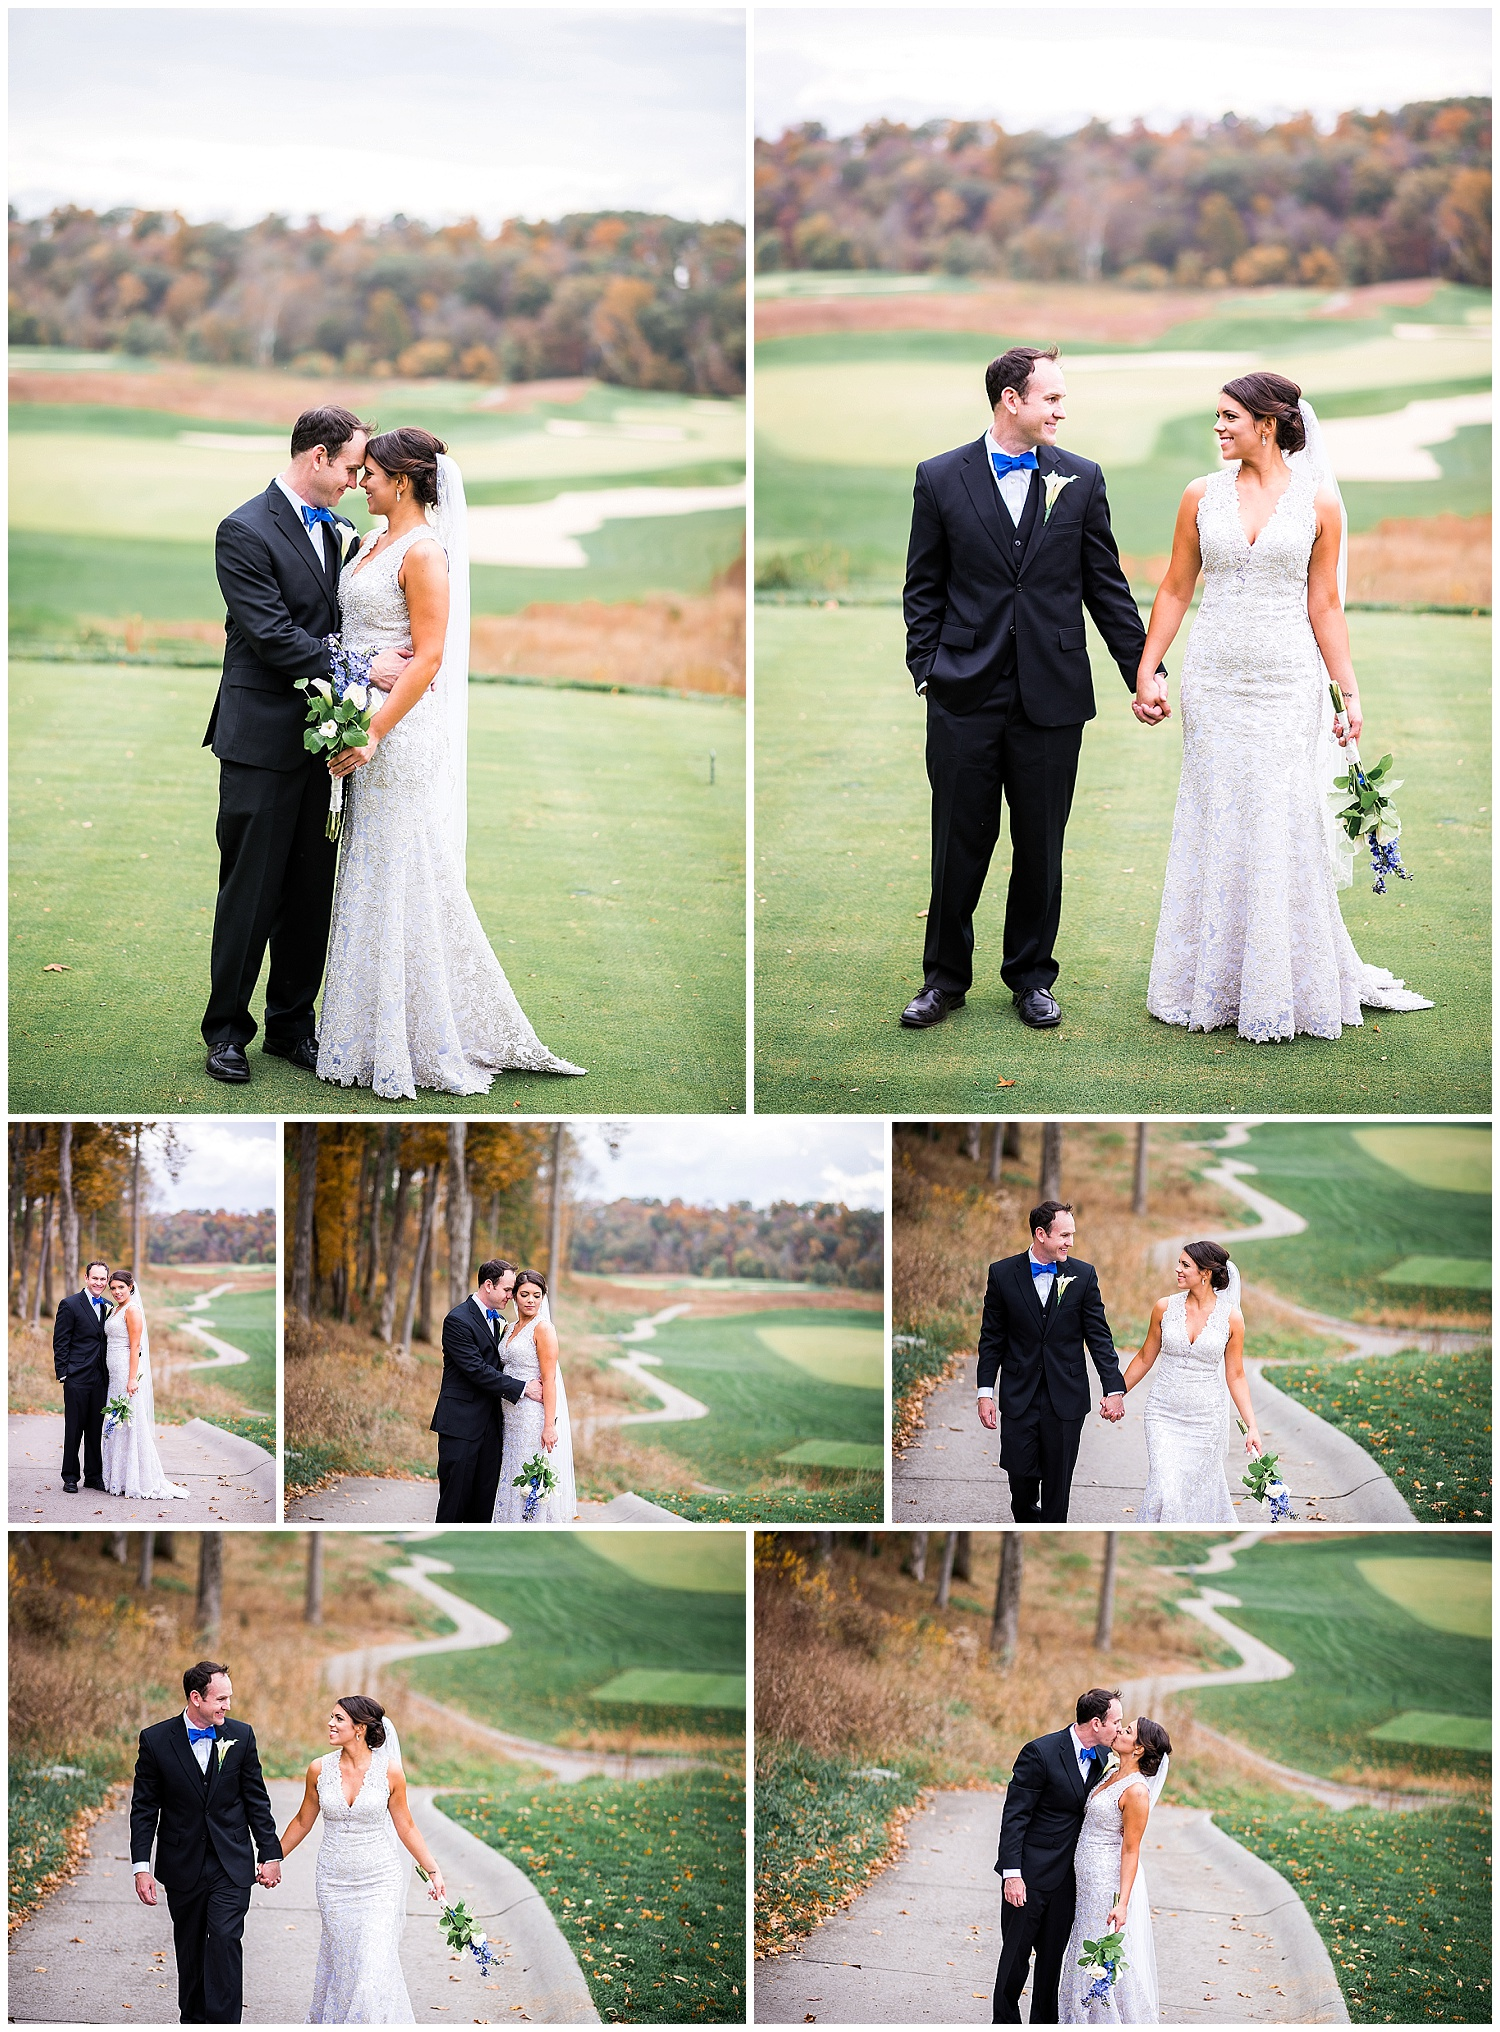 sarah_justin_olde_stone_wedding-6465.jpg